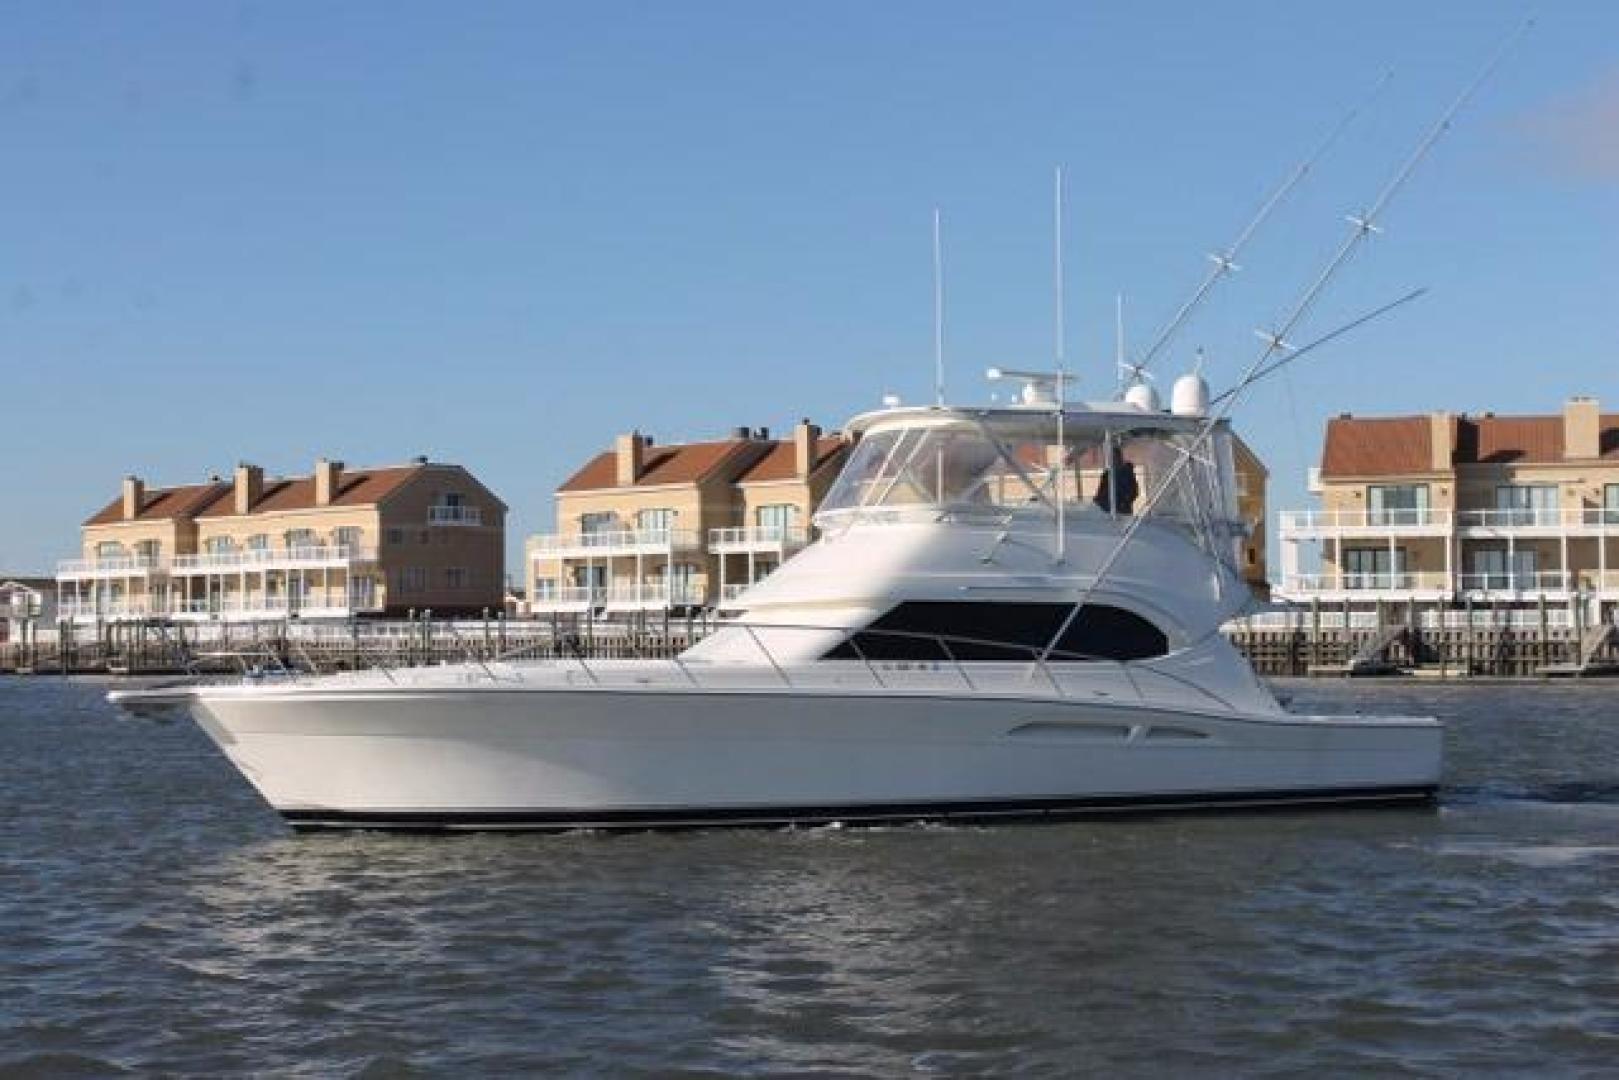 Riviera-Convertible 2008-Dolphin Seeker Wildwood-New Jersey-United States-Profile-928442 | Thumbnail